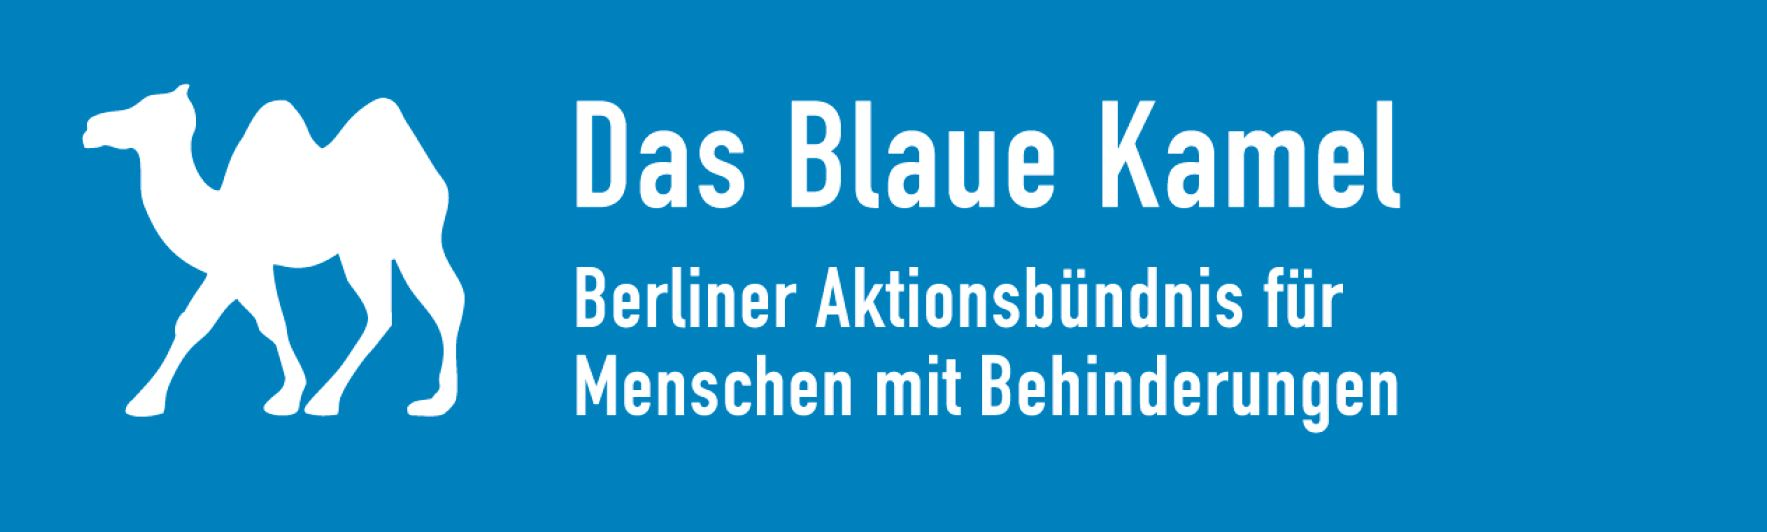 Headerbild: Das Blaue Kamel